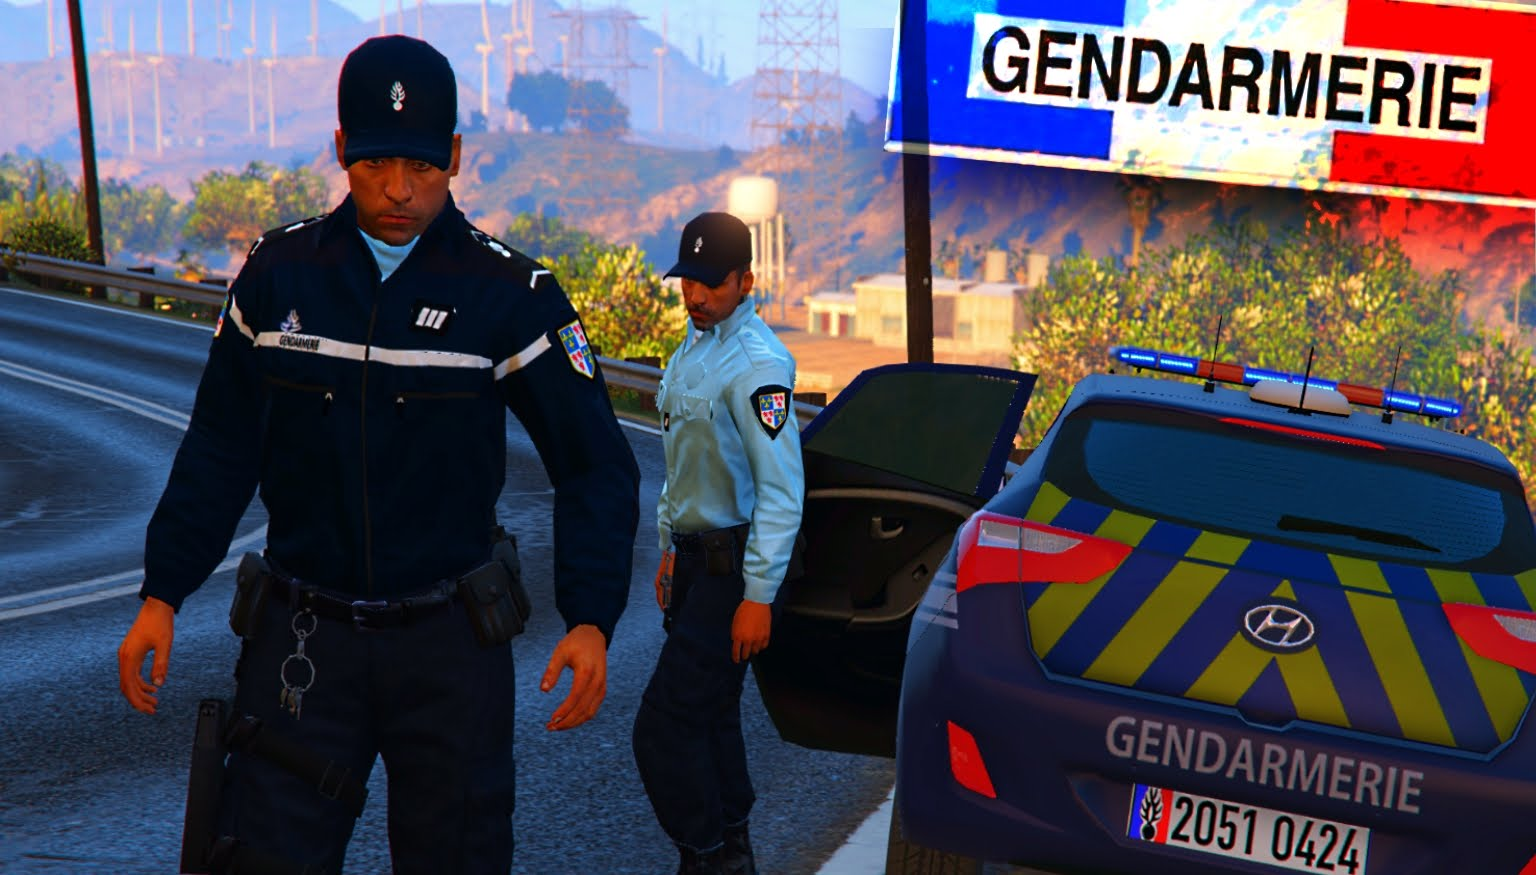 jeux gendarmerie